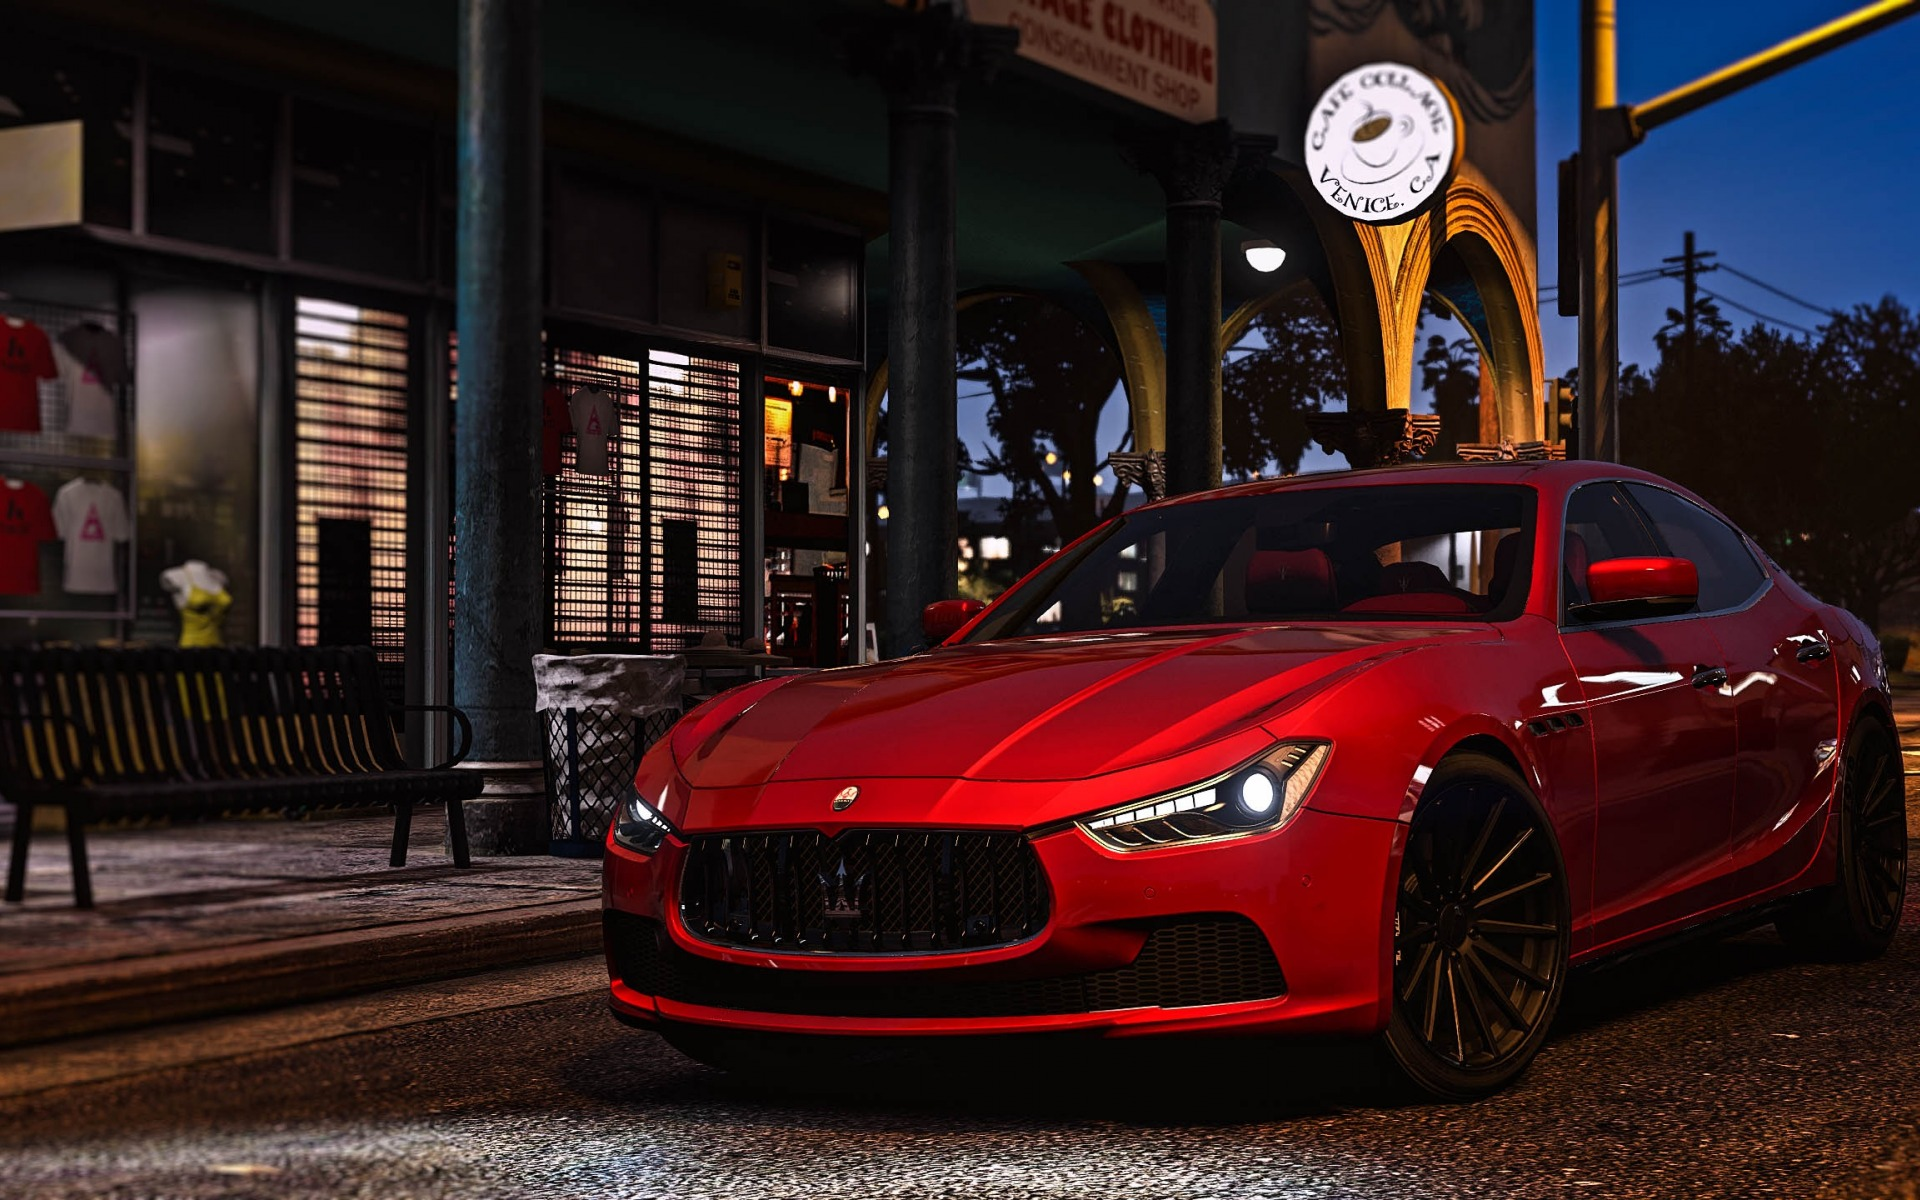 Gta 5, Maserati Ghibli, Grand Theft Auto V, Red Ghibli, - Maserati Gta , HD Wallpaper & Backgrounds